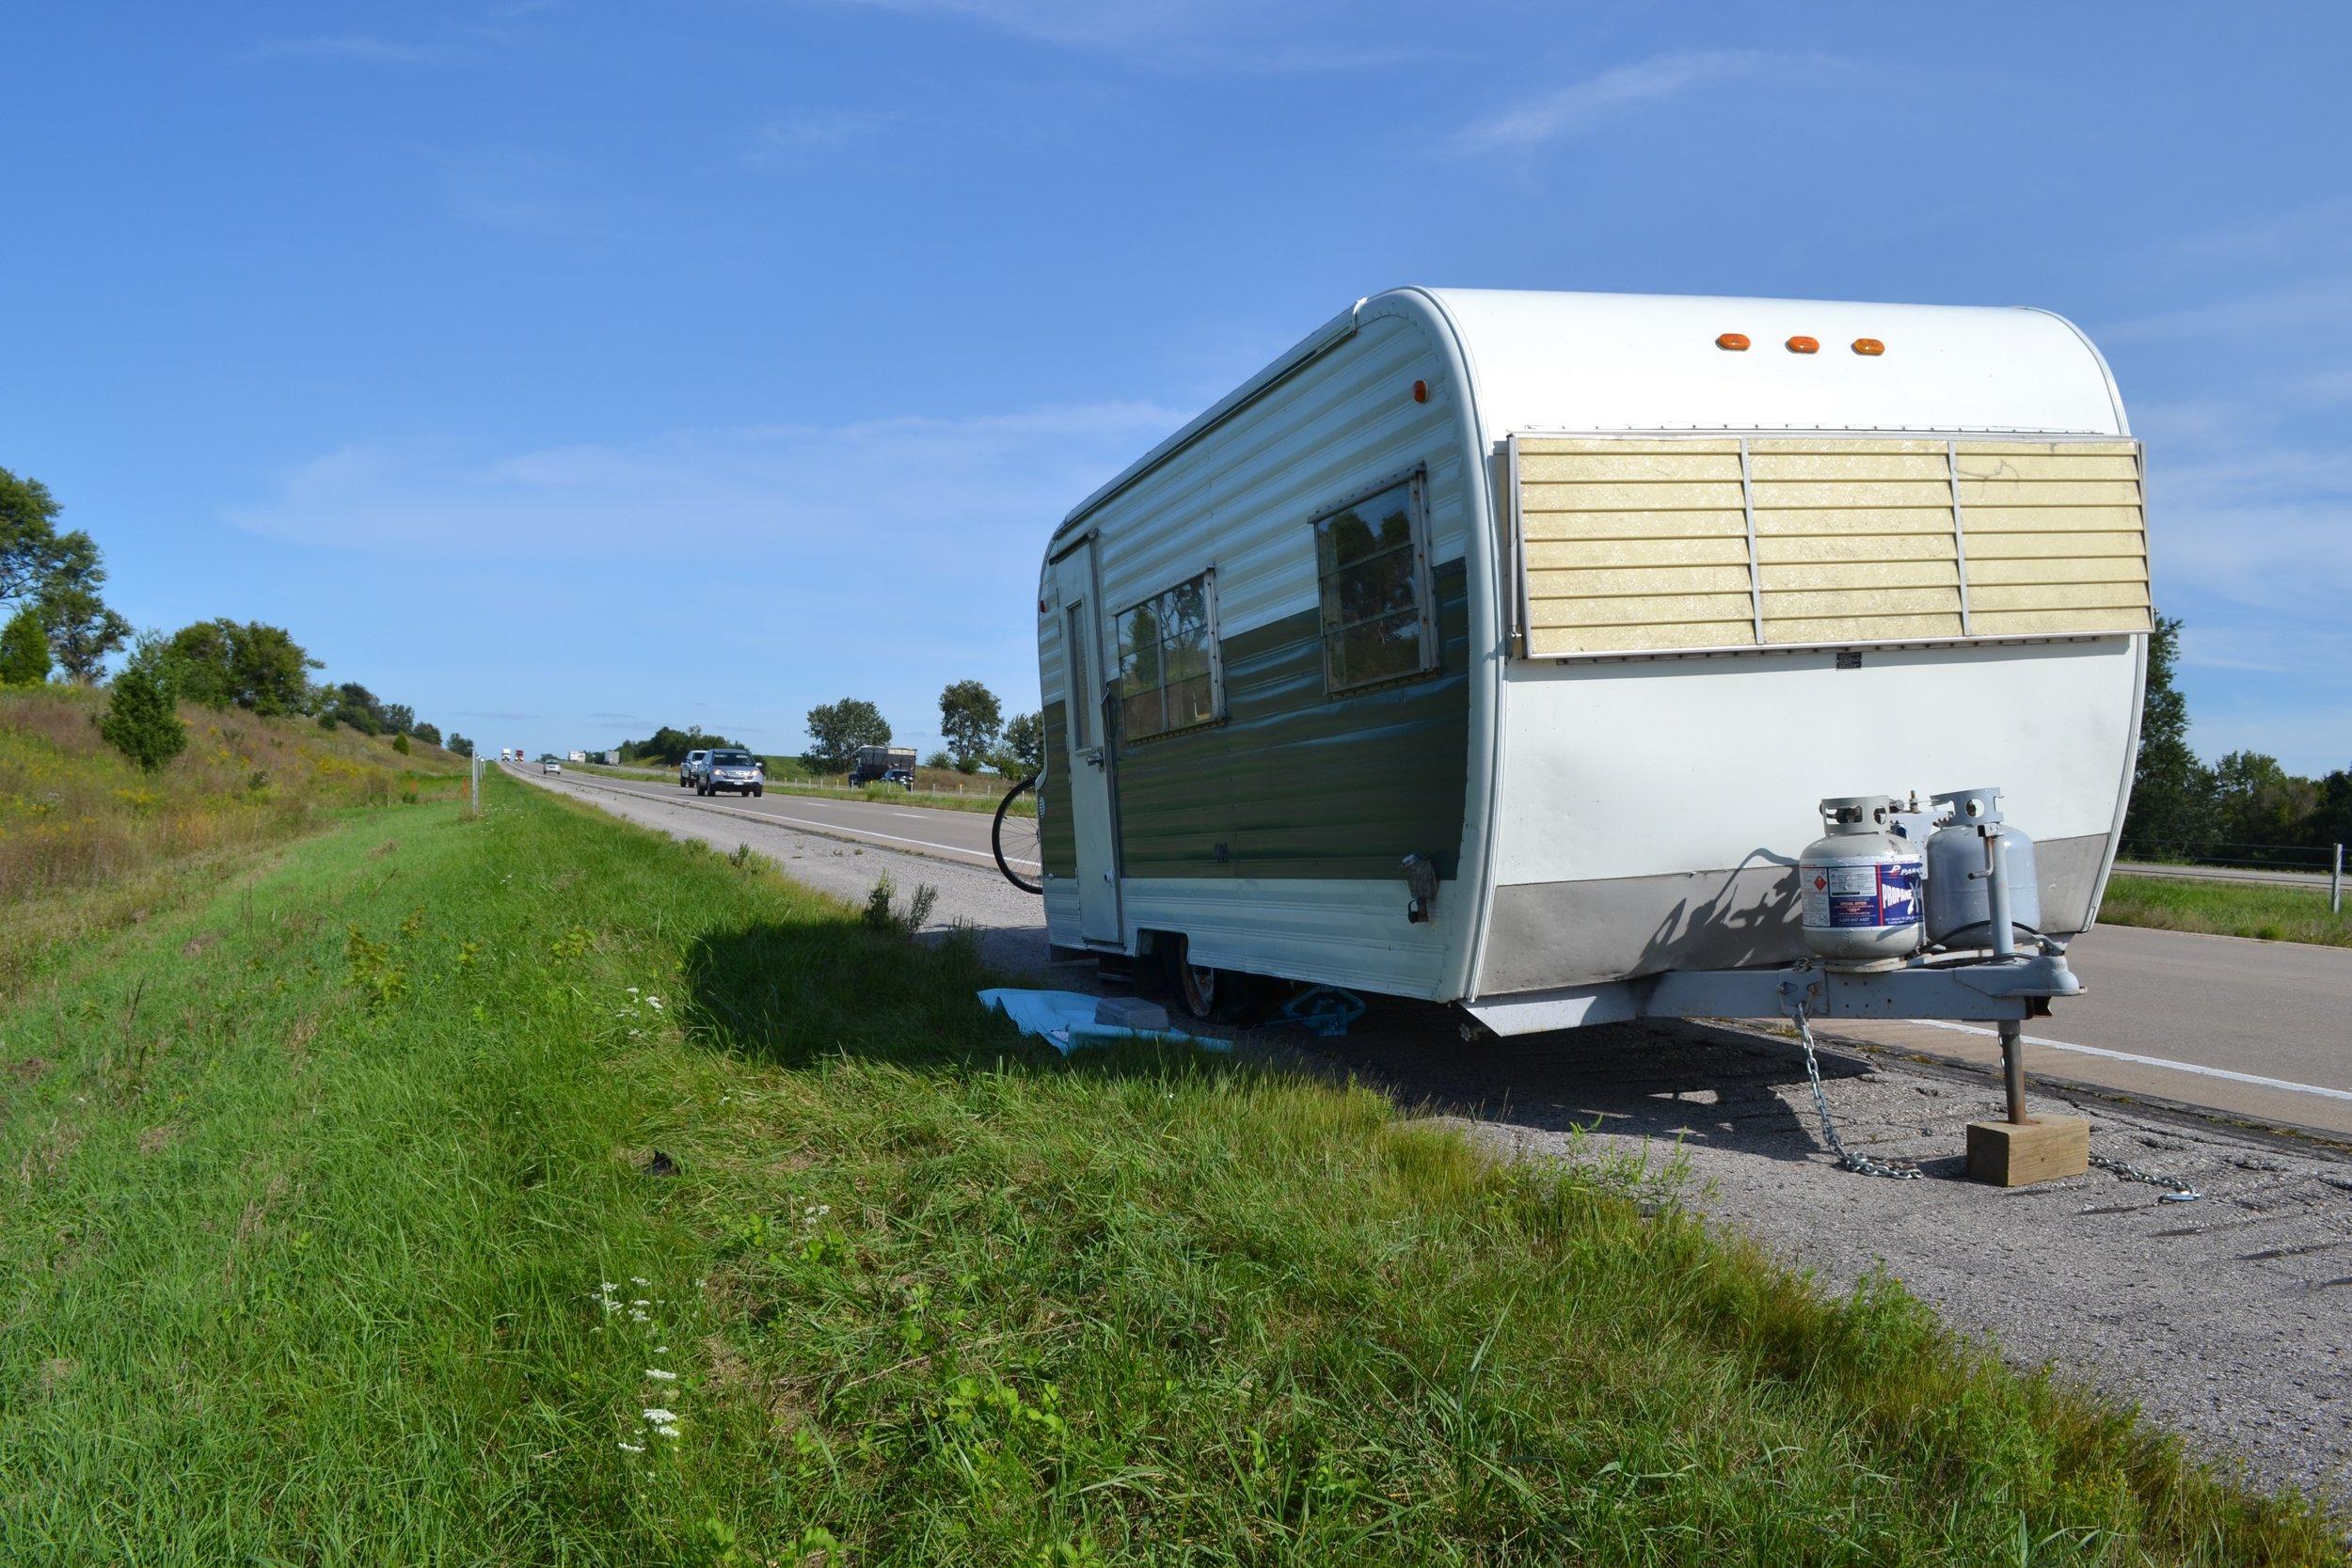 Elsie teetering on the edge of I-80.